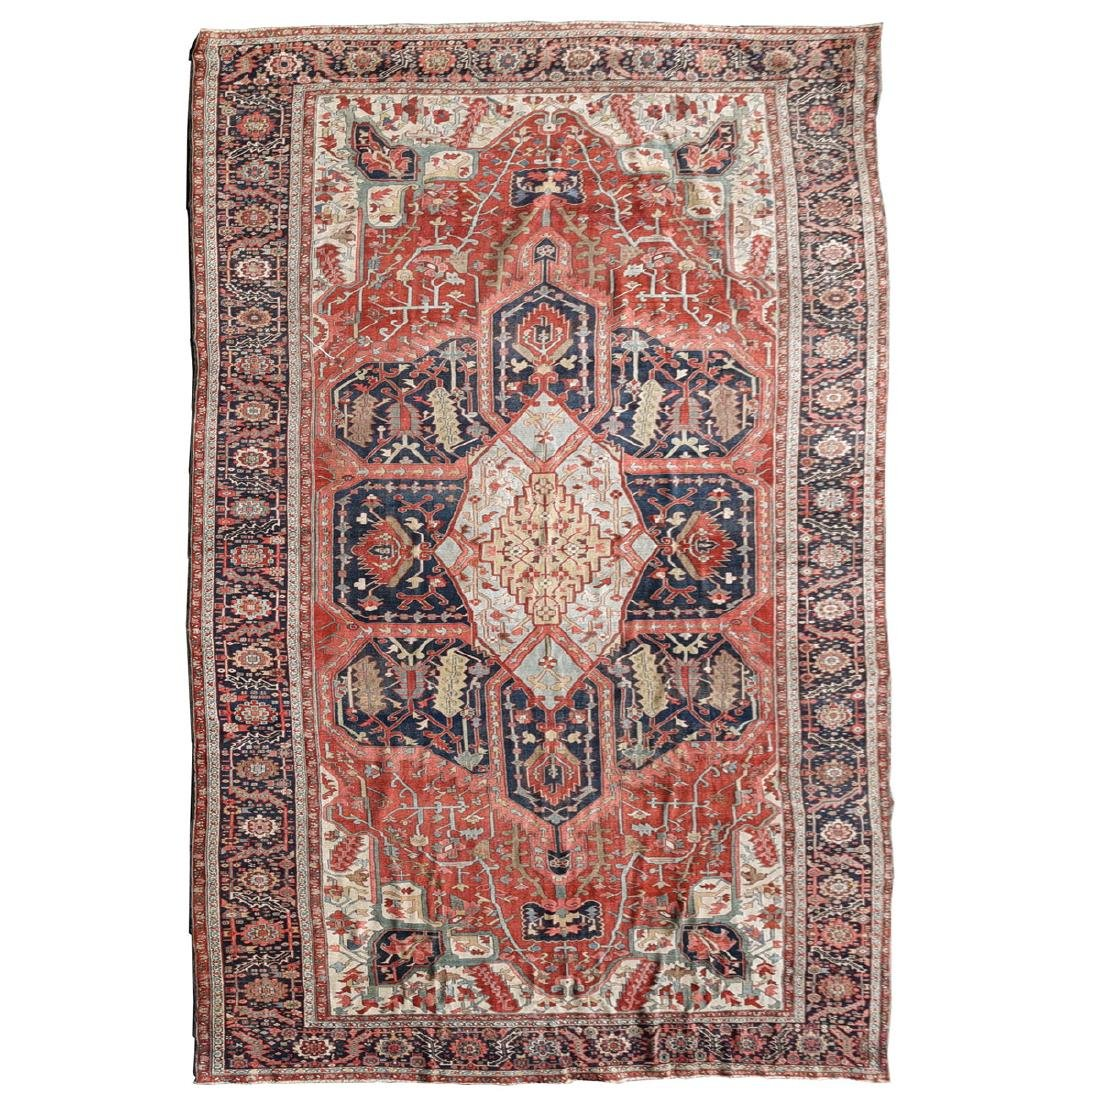 Palatial Serapi Carpet, Early 20th Century